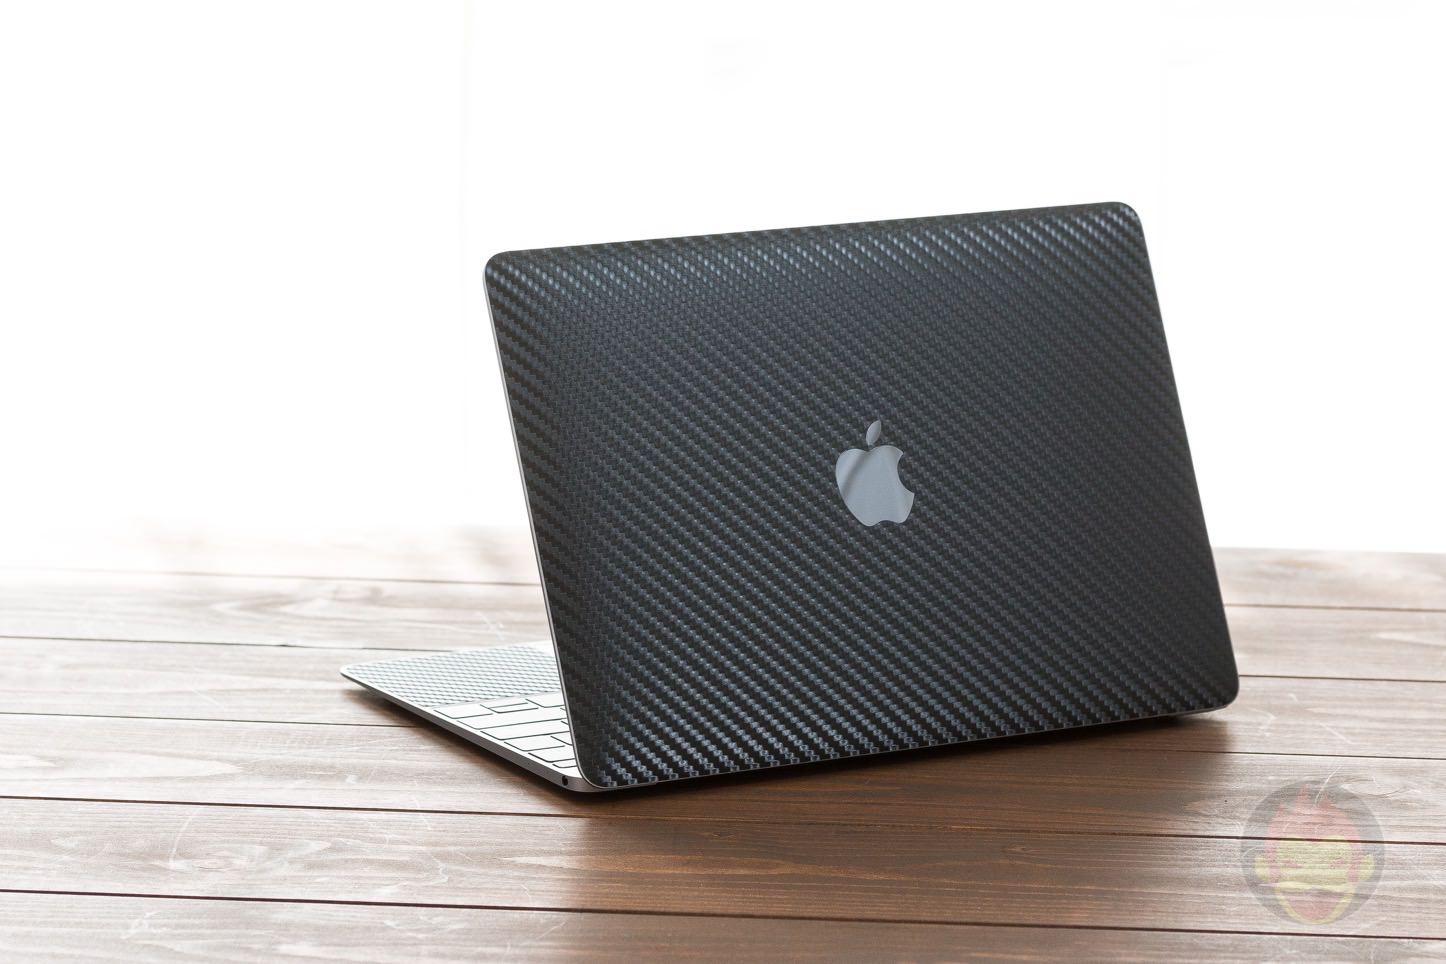 2016 MacBook 1.3GHz